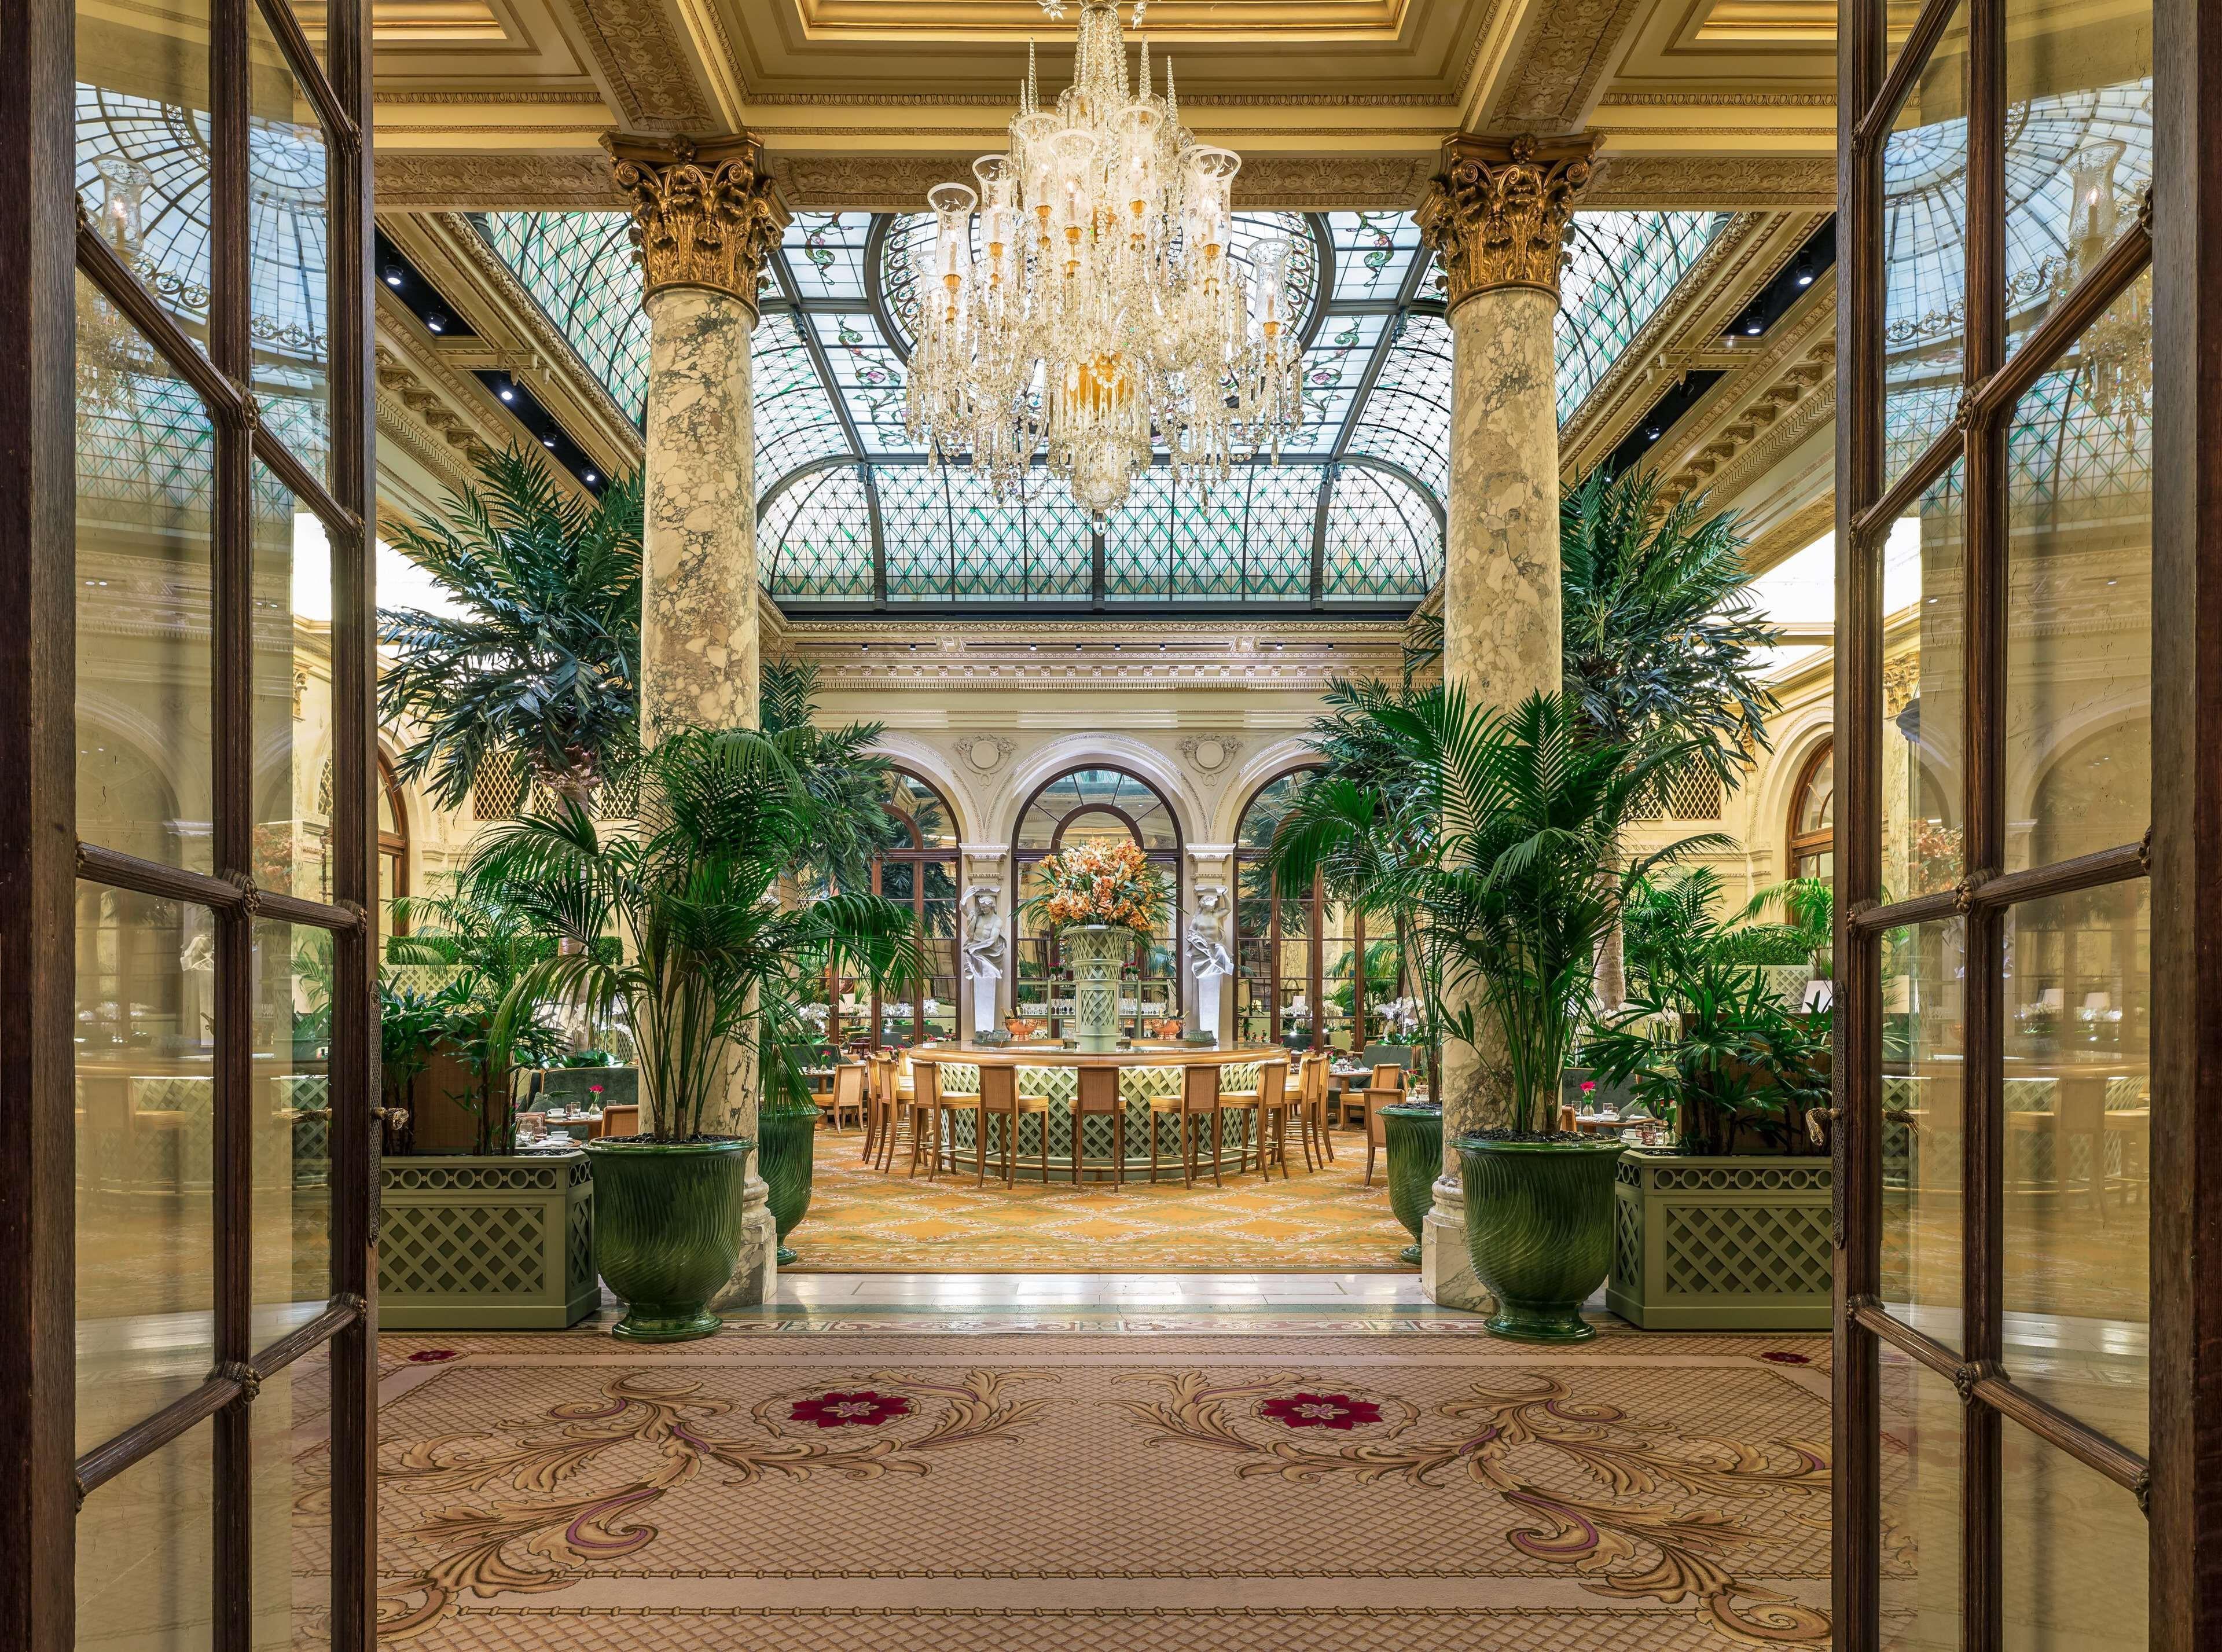 Courtesy of The Plaza Hotel / Expedia